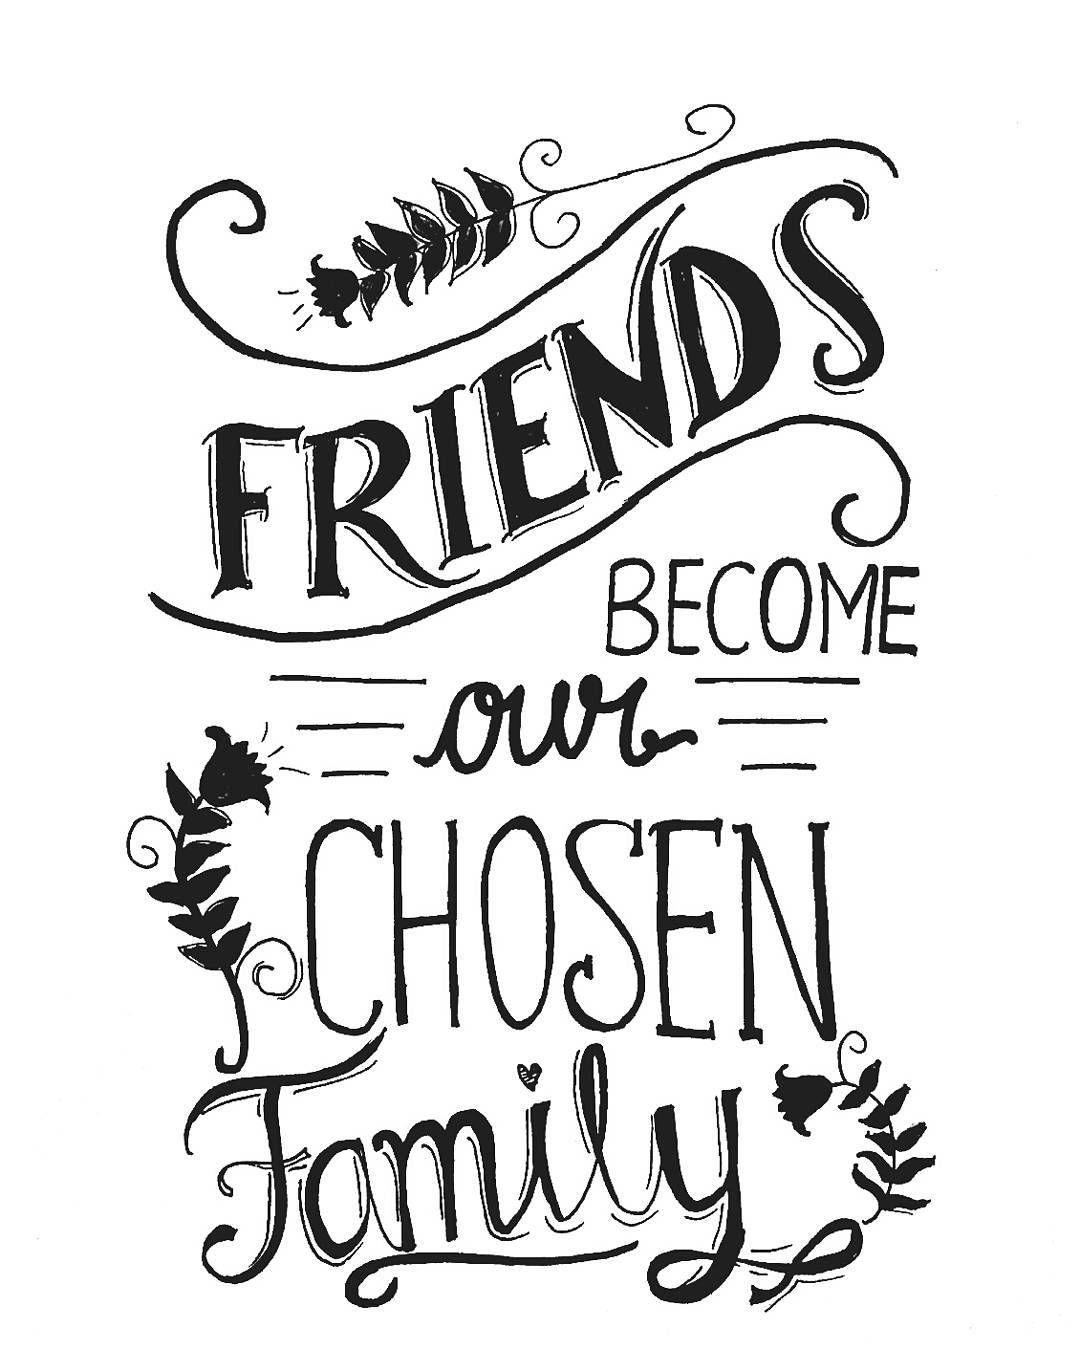 Familybondingquotes inspirationalfamilyquotes shortfamilyquotes familyquotesandsayings familyquotesfrombible funnyfamilyquotes famous quotes